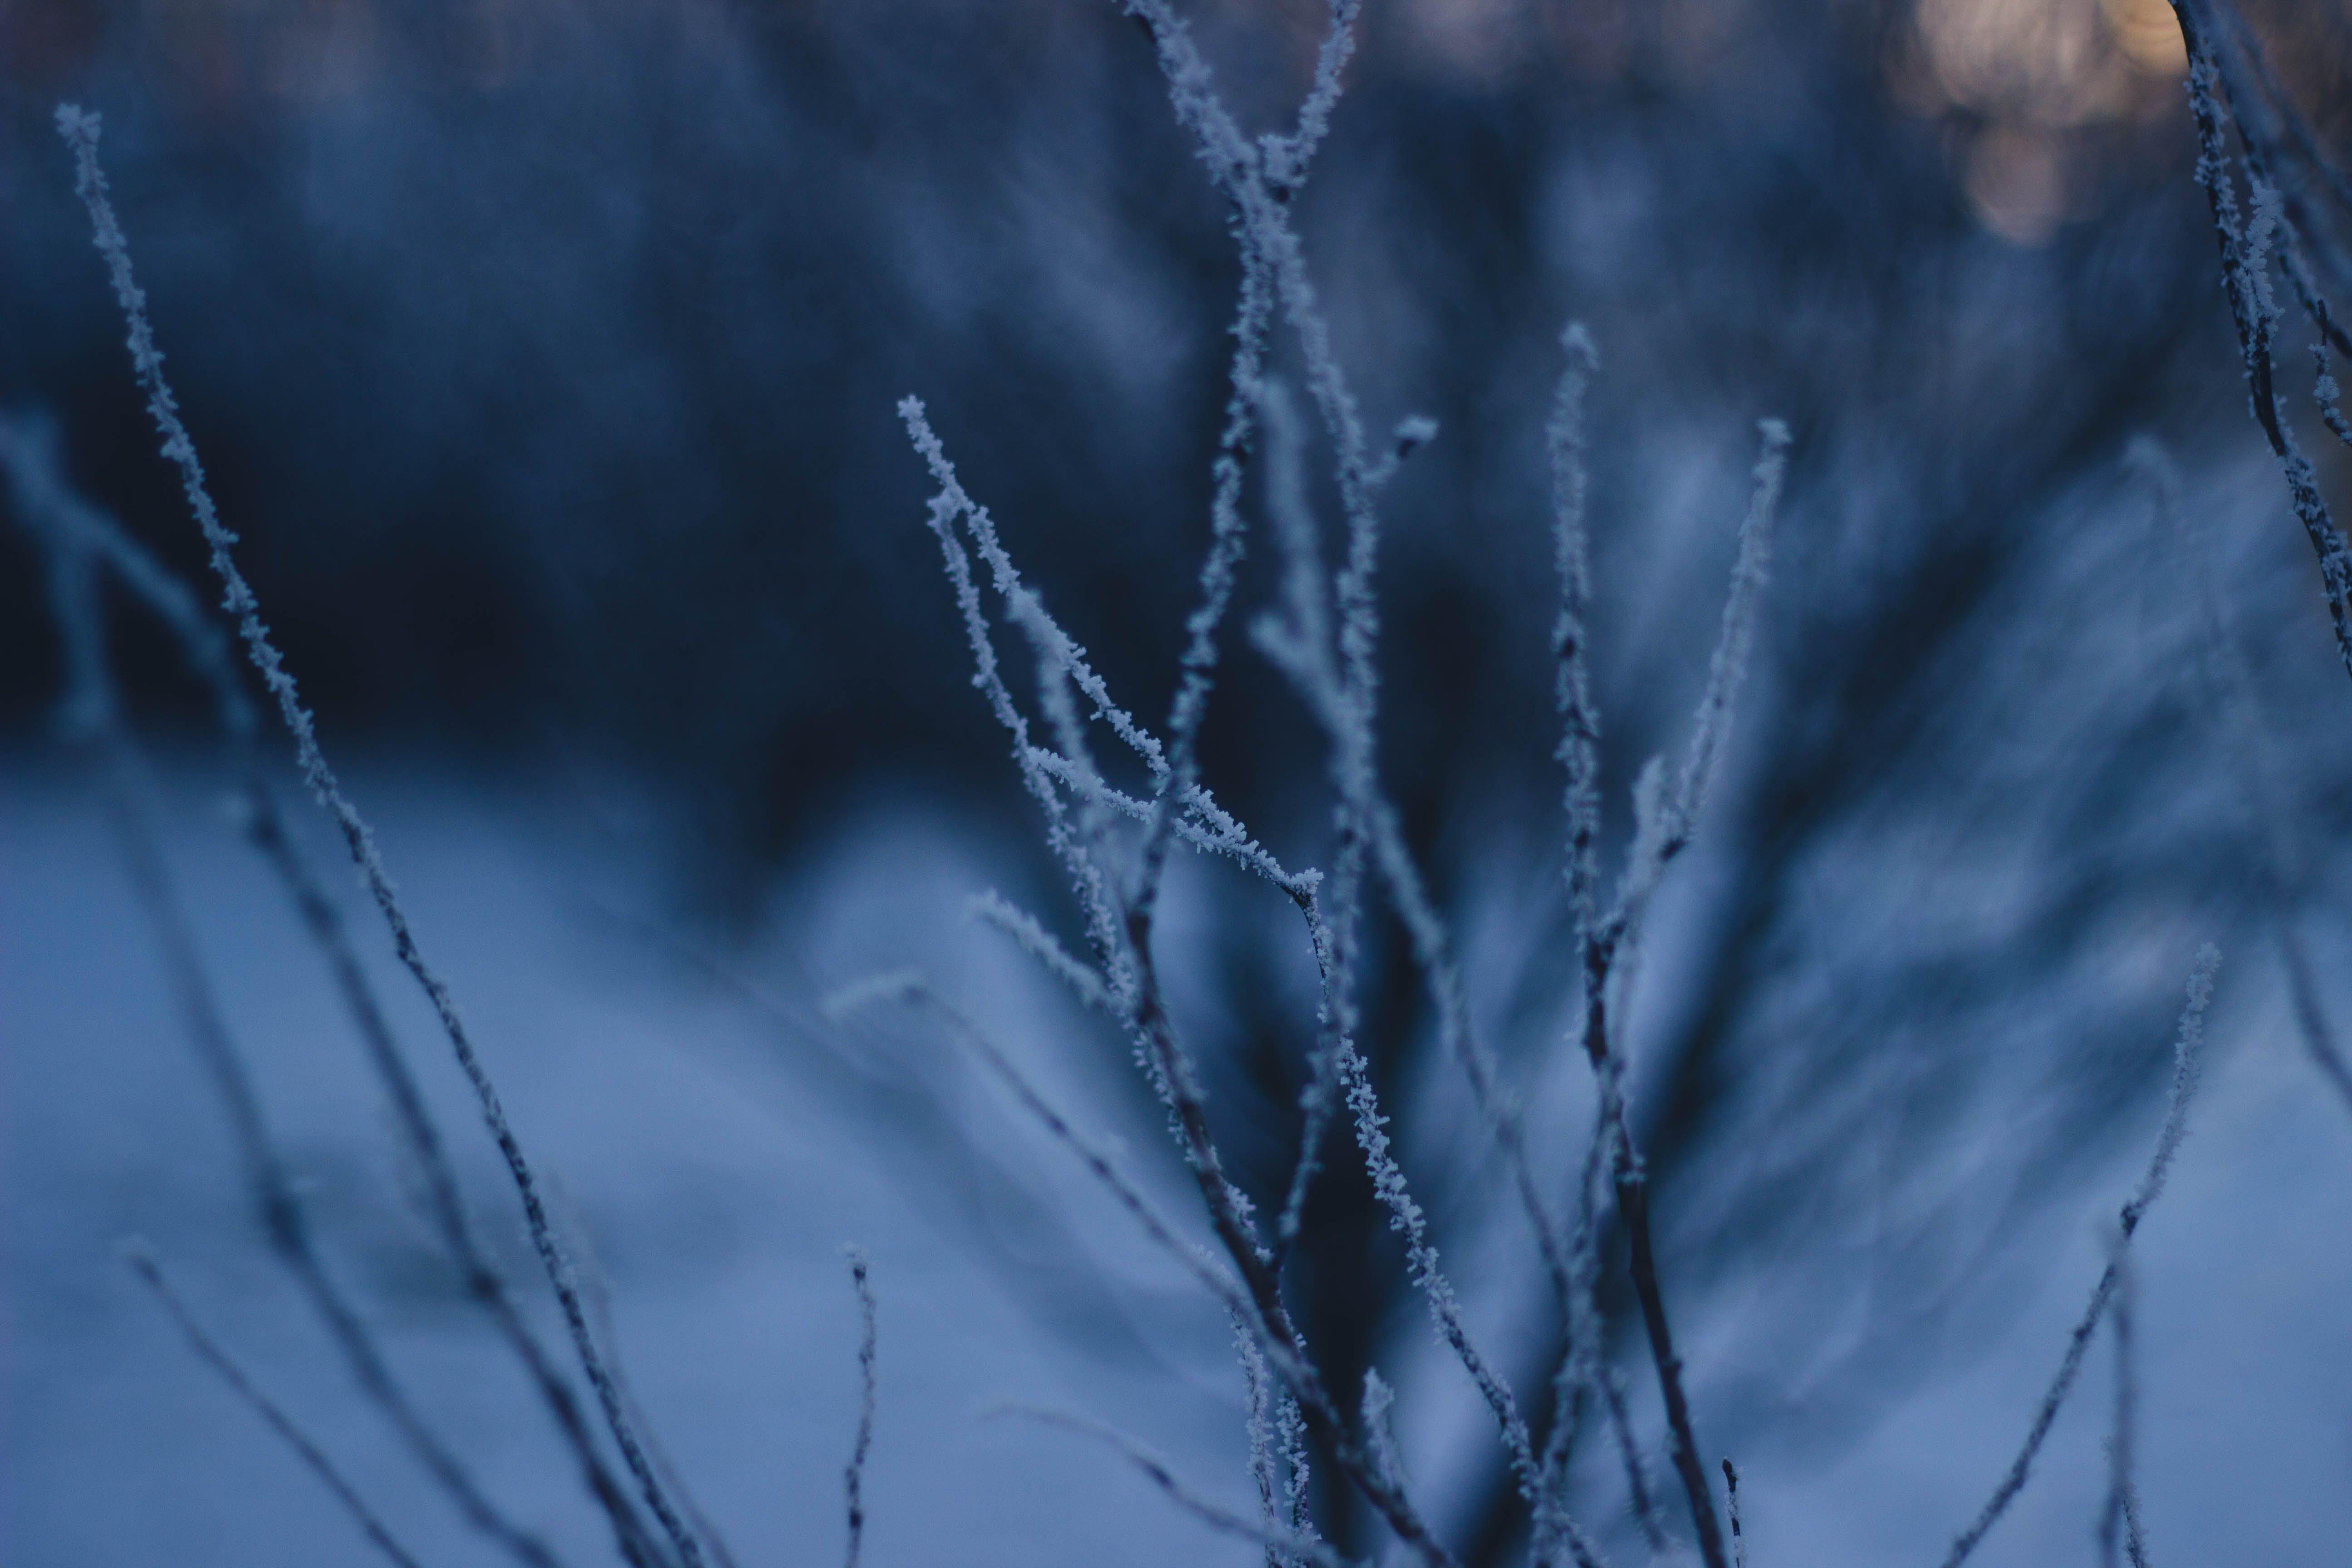 Kostenloses Stock Foto zu dunkel, frost, gefroren, kalt